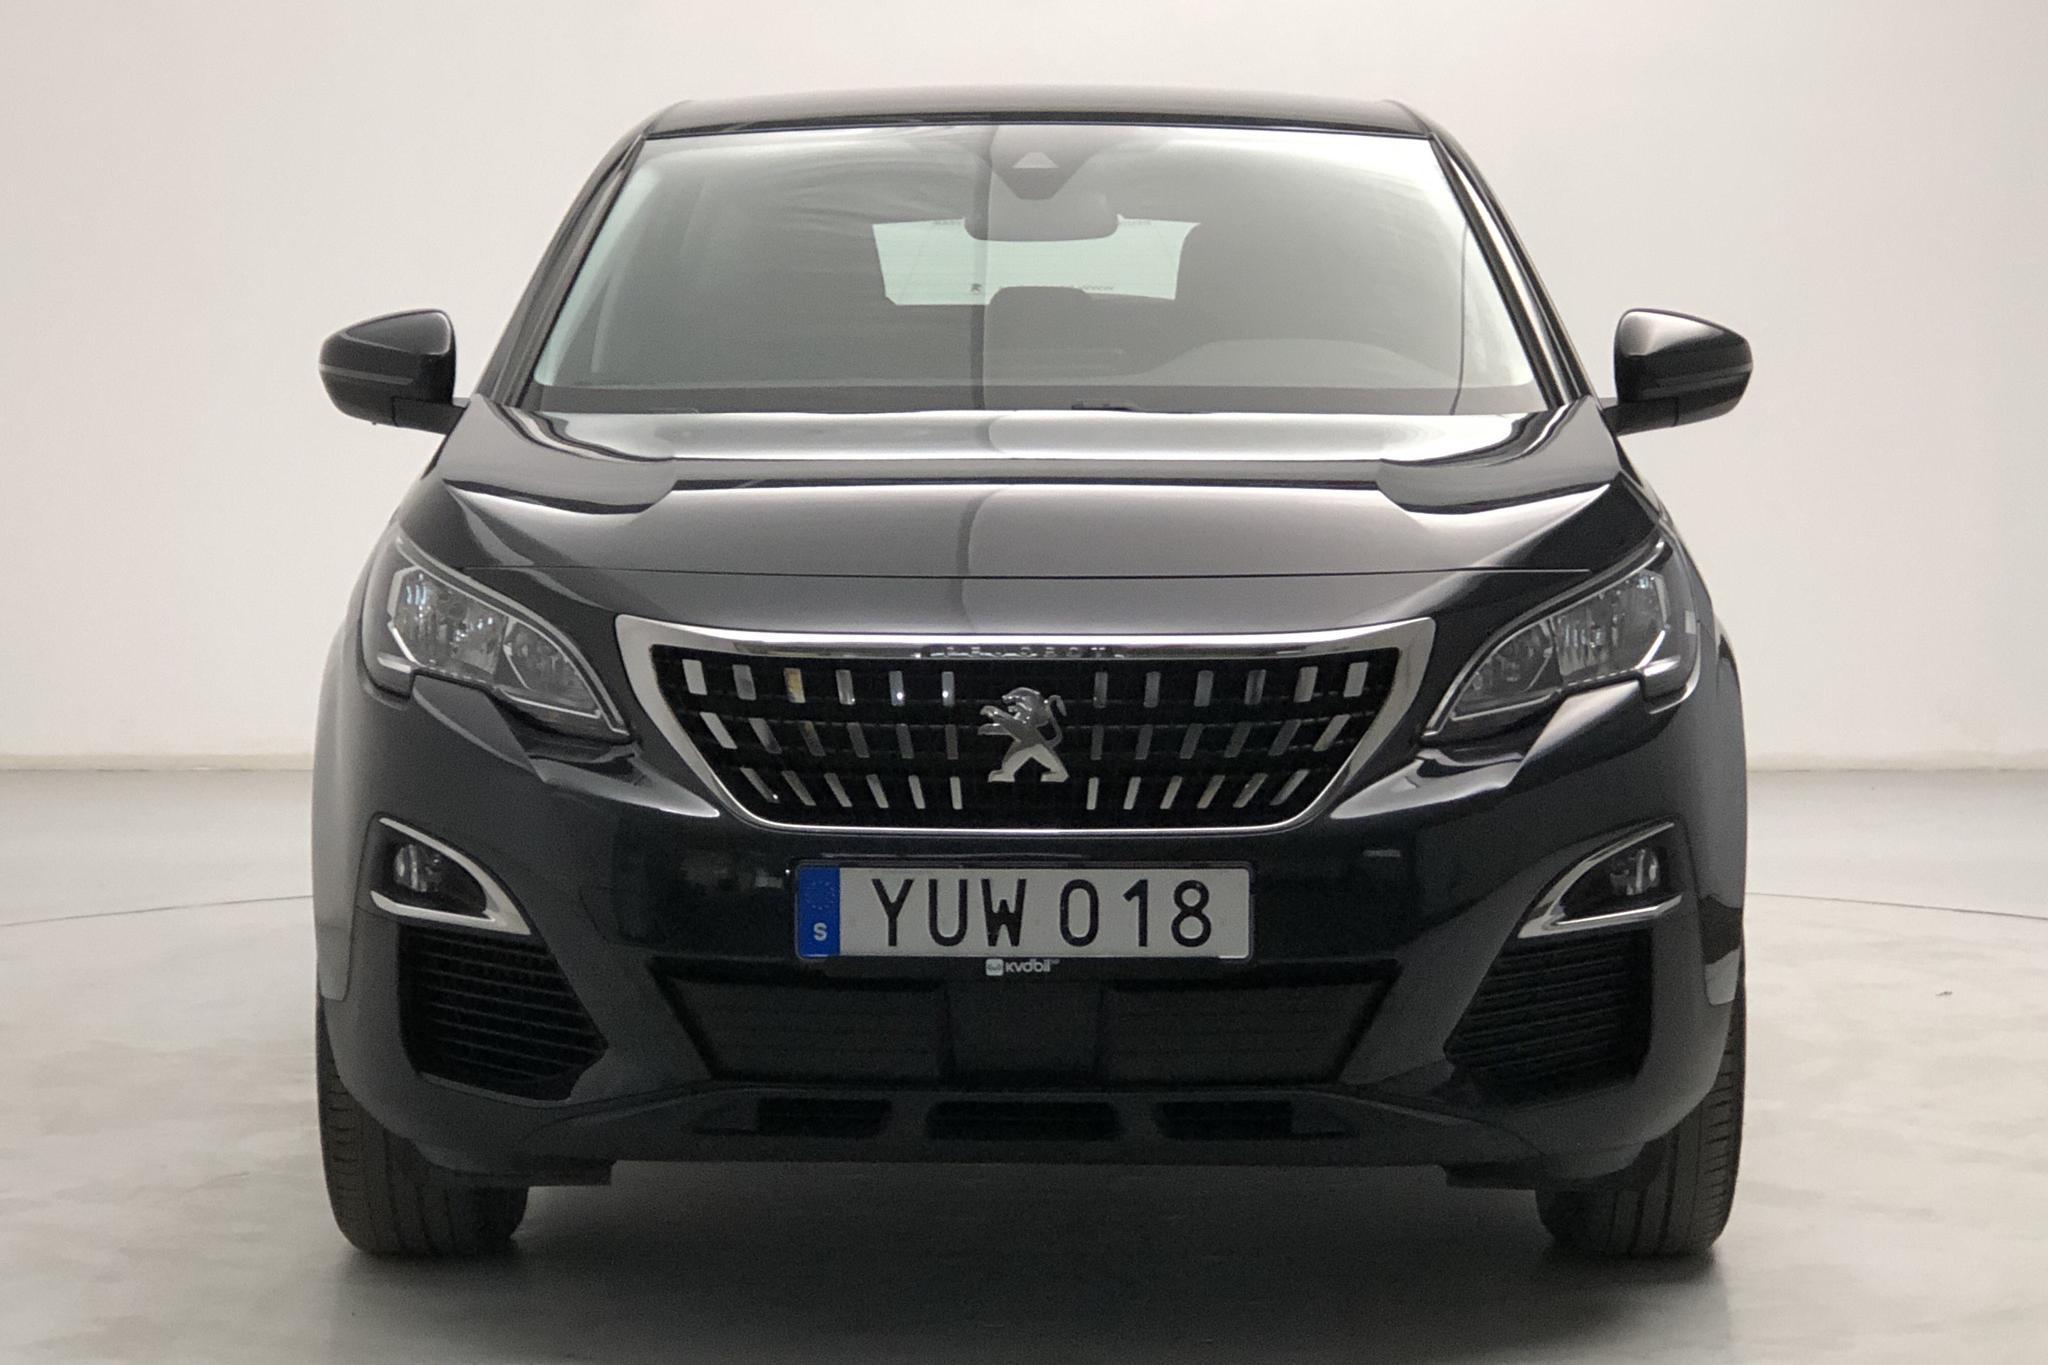 Peugeot 3008 1.6 BlueHDi (120hk) - 59 690 km - Automatic - 2018